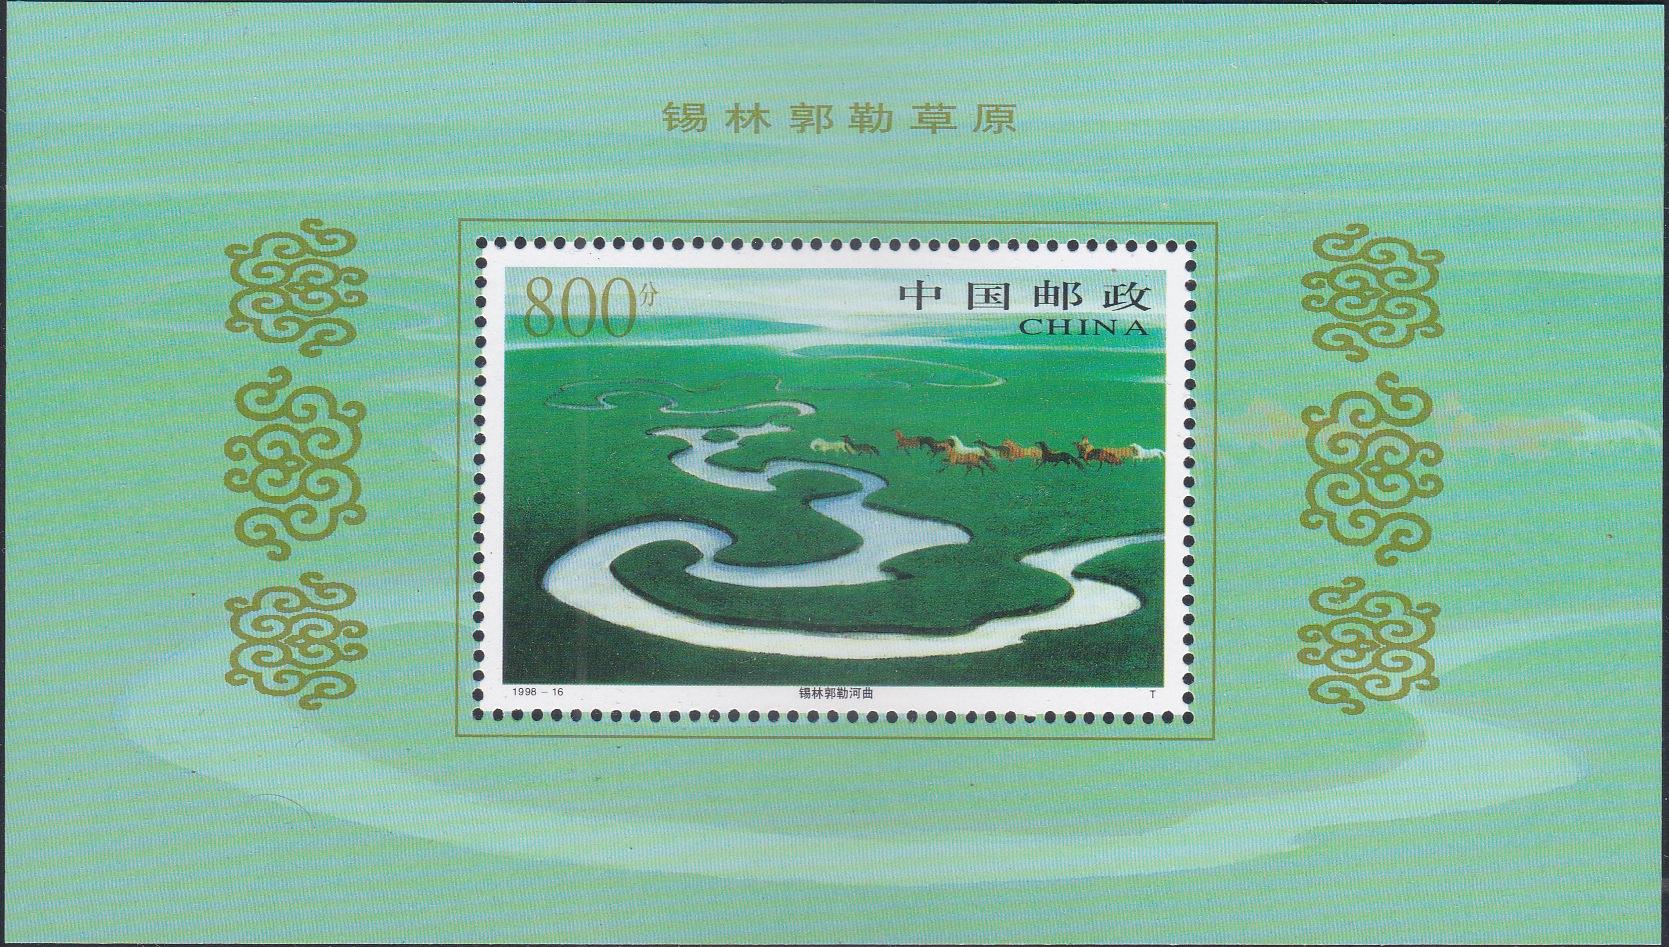 2879 Xilinguole River Bend [Xilinguole Grassland] - China Souvenir Sheet